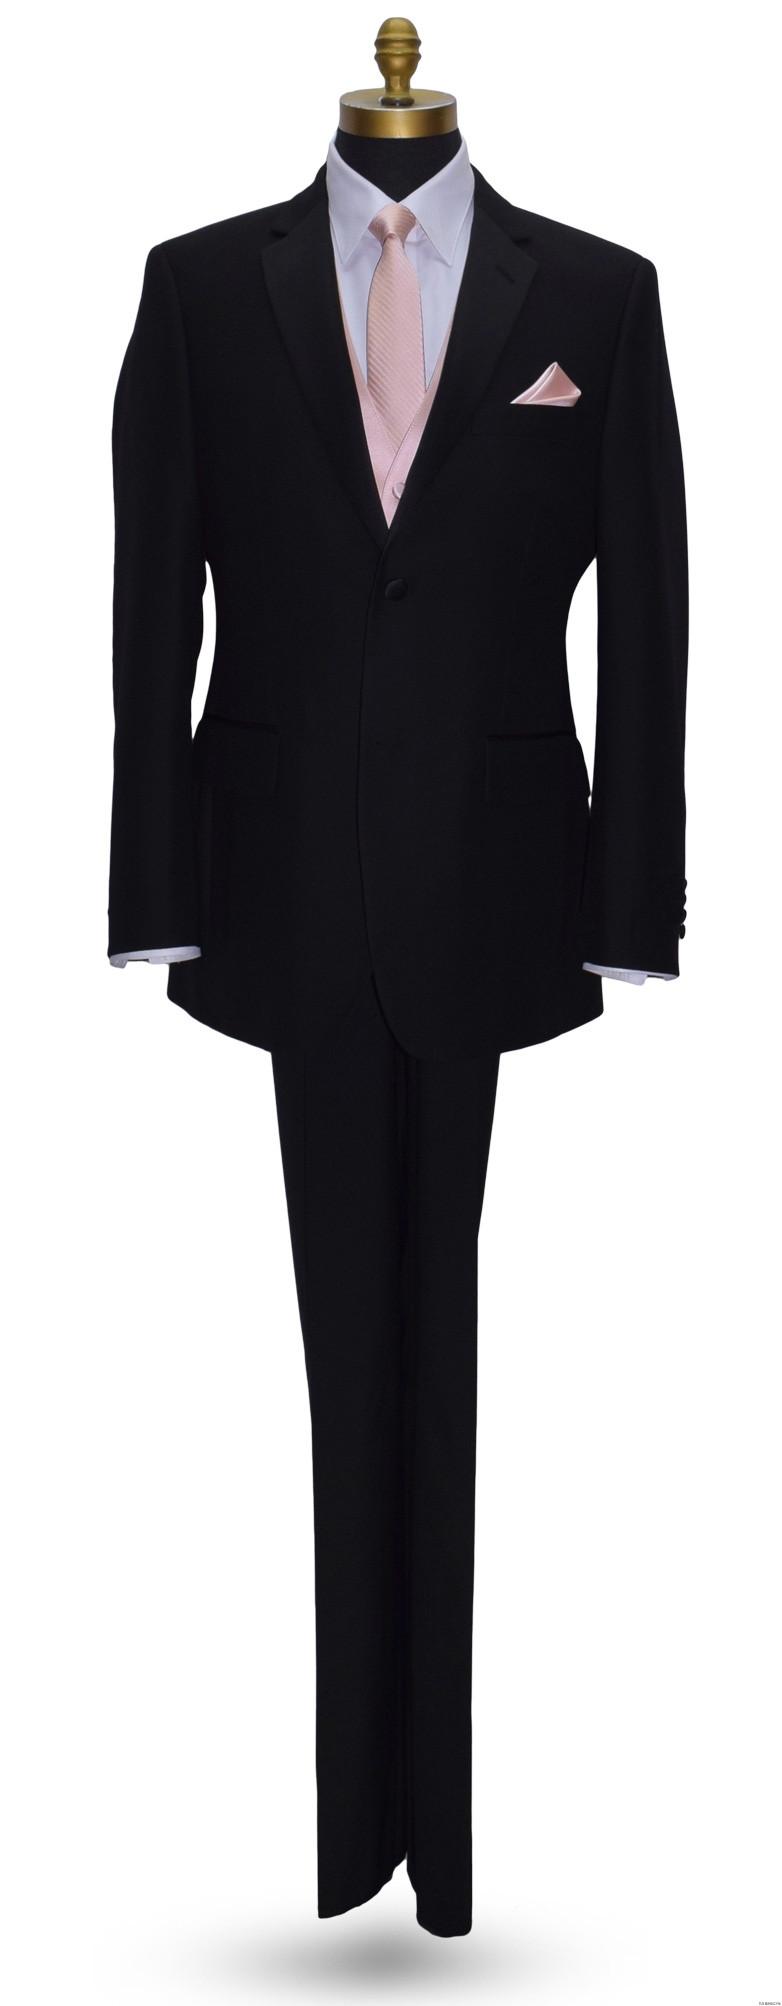 blush long tie and vest on black tuxedo at tuxbling.com